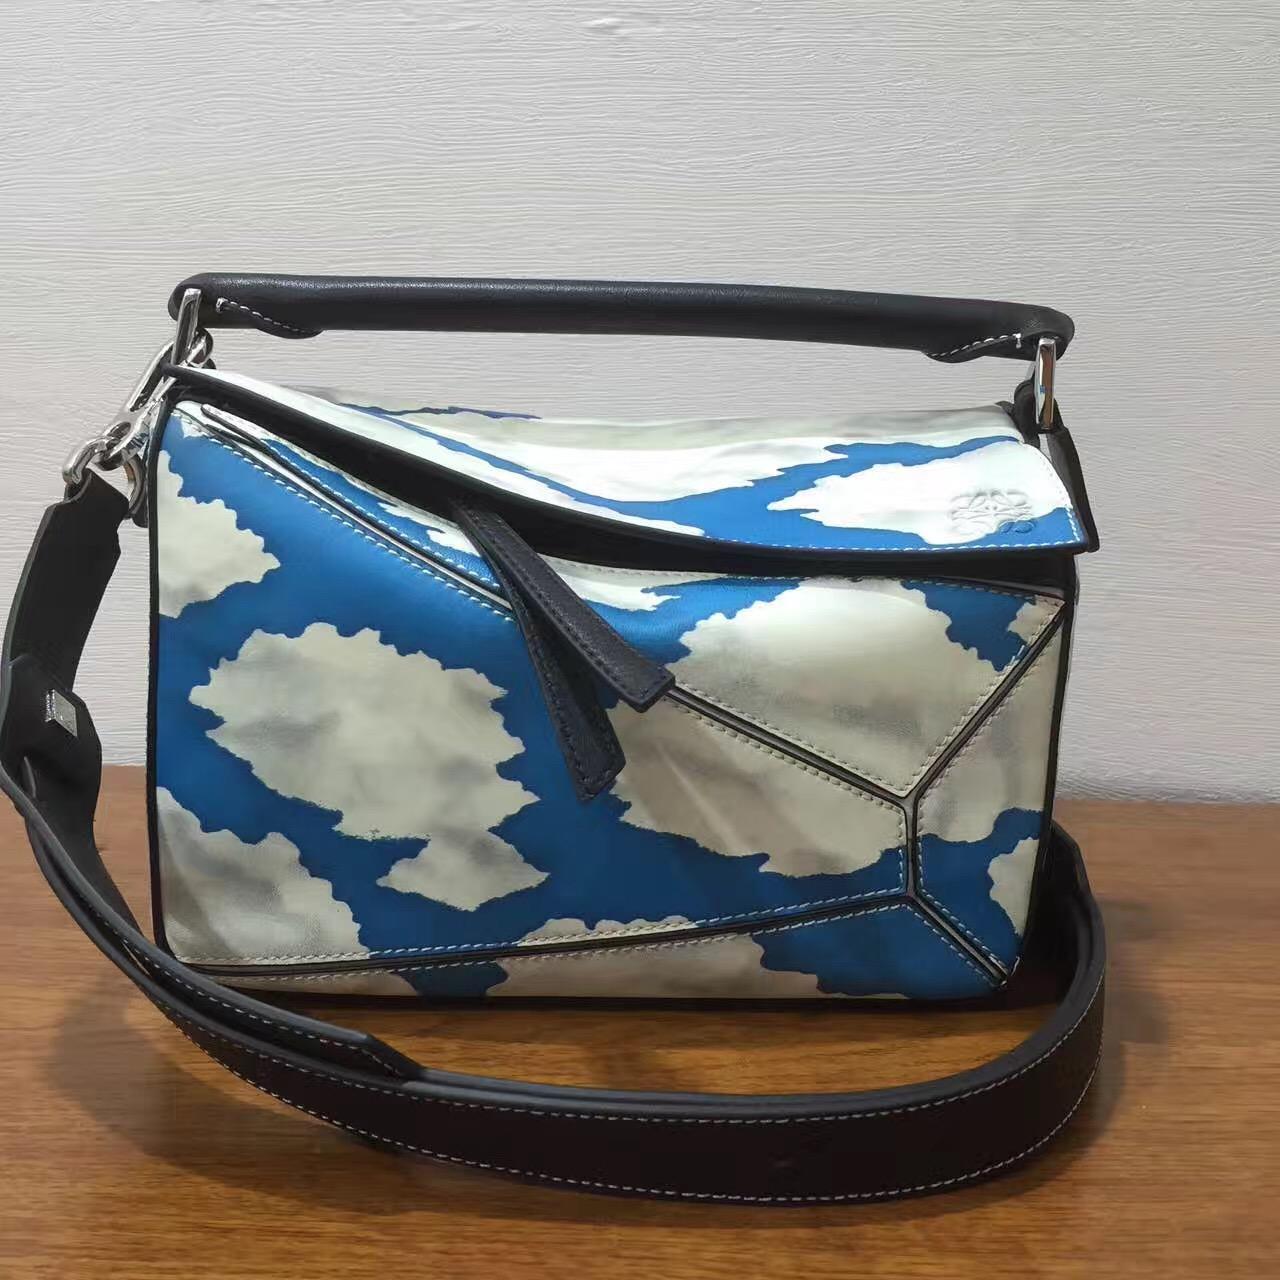 loewe羅意威小號 Puzzle Bag 進口西班牙小牛皮印藍天白雲圖案